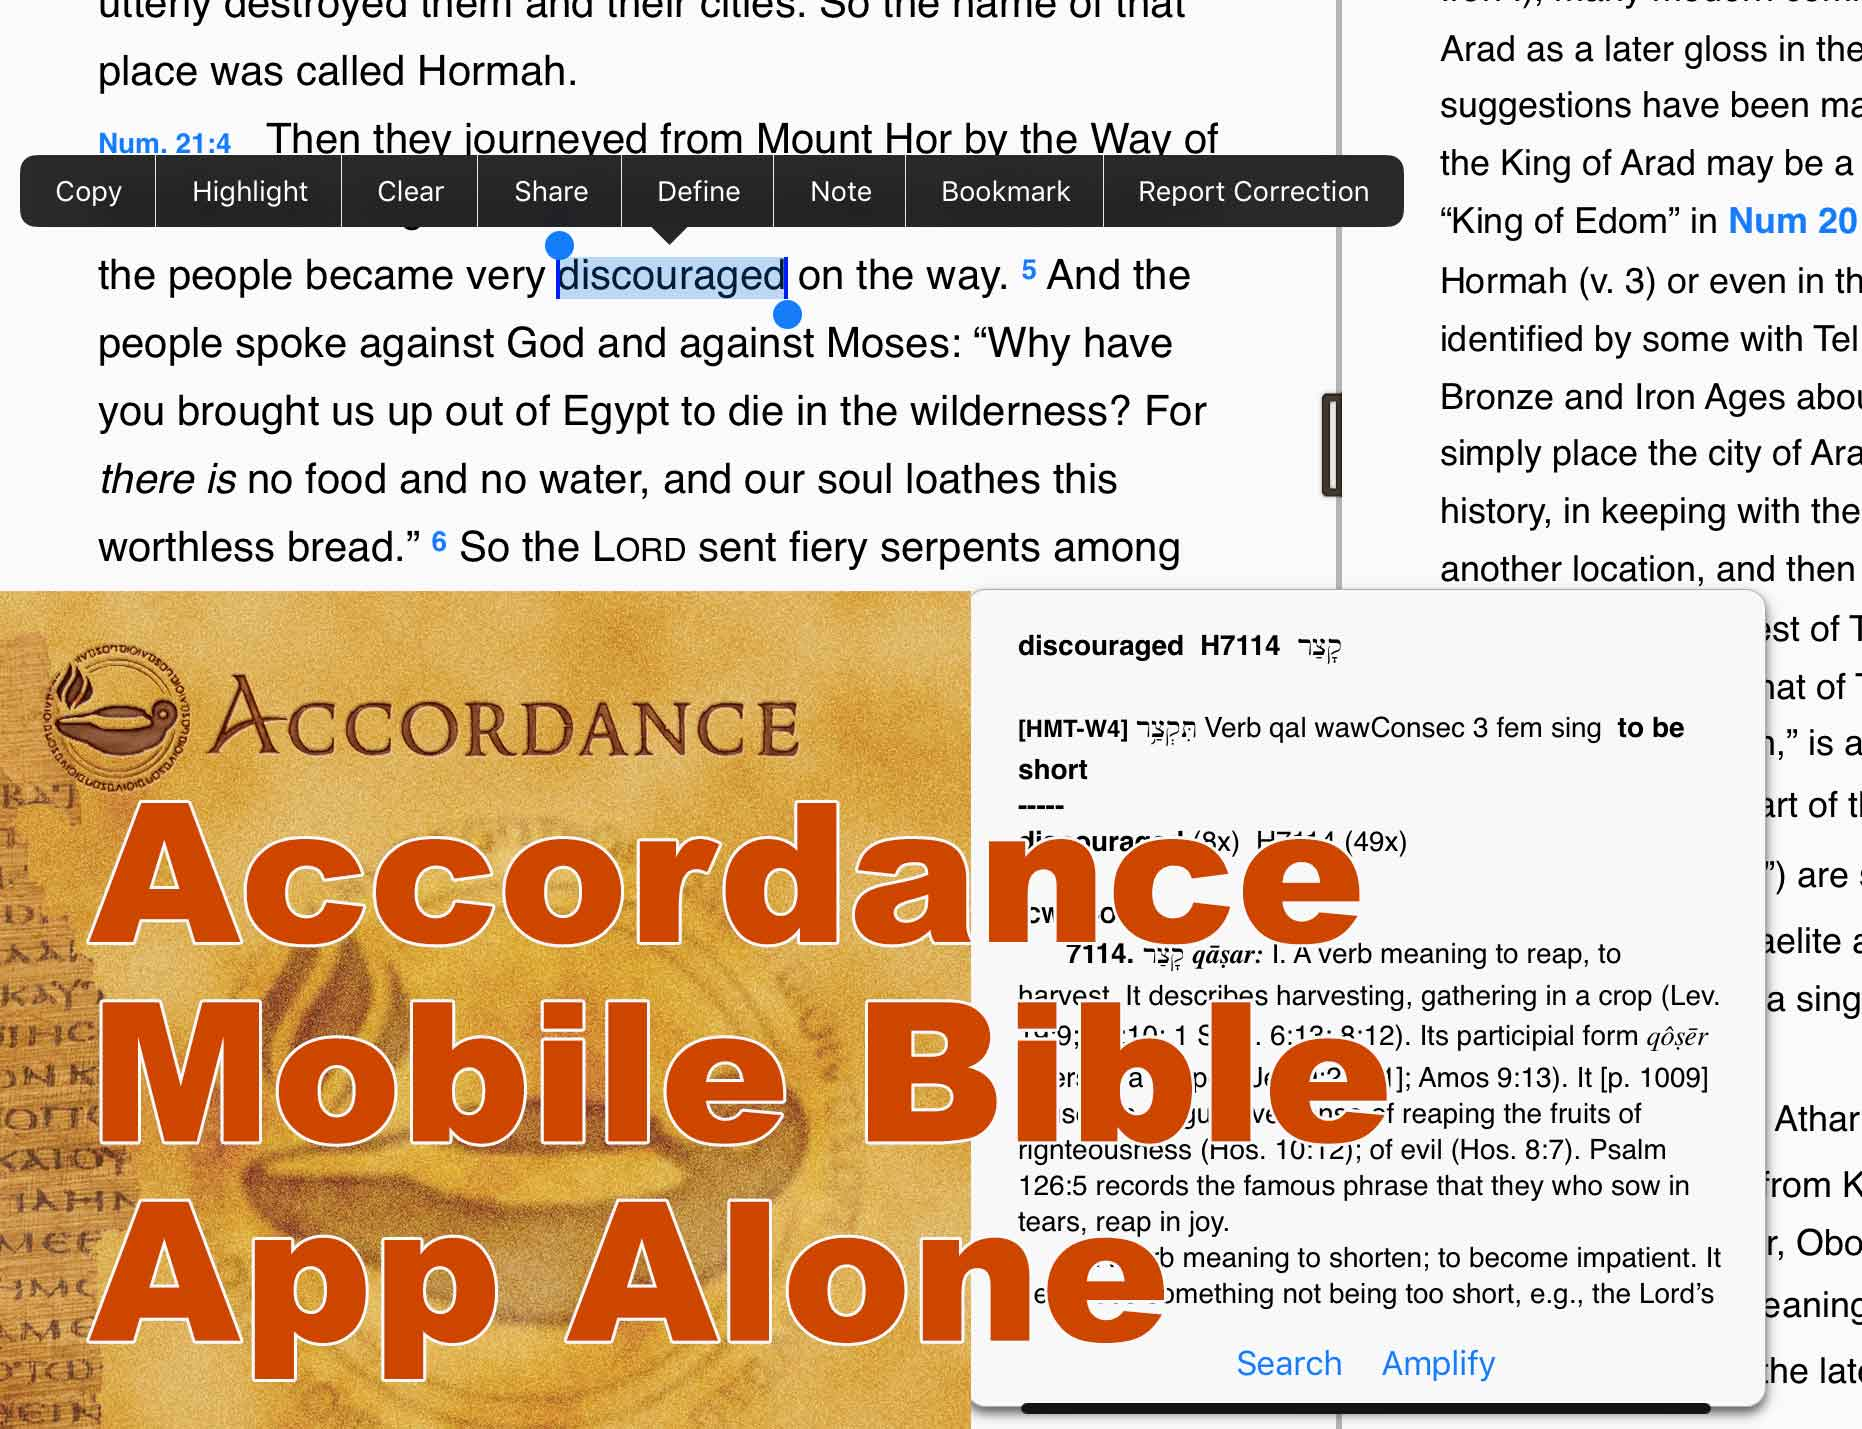 accordance-mobile